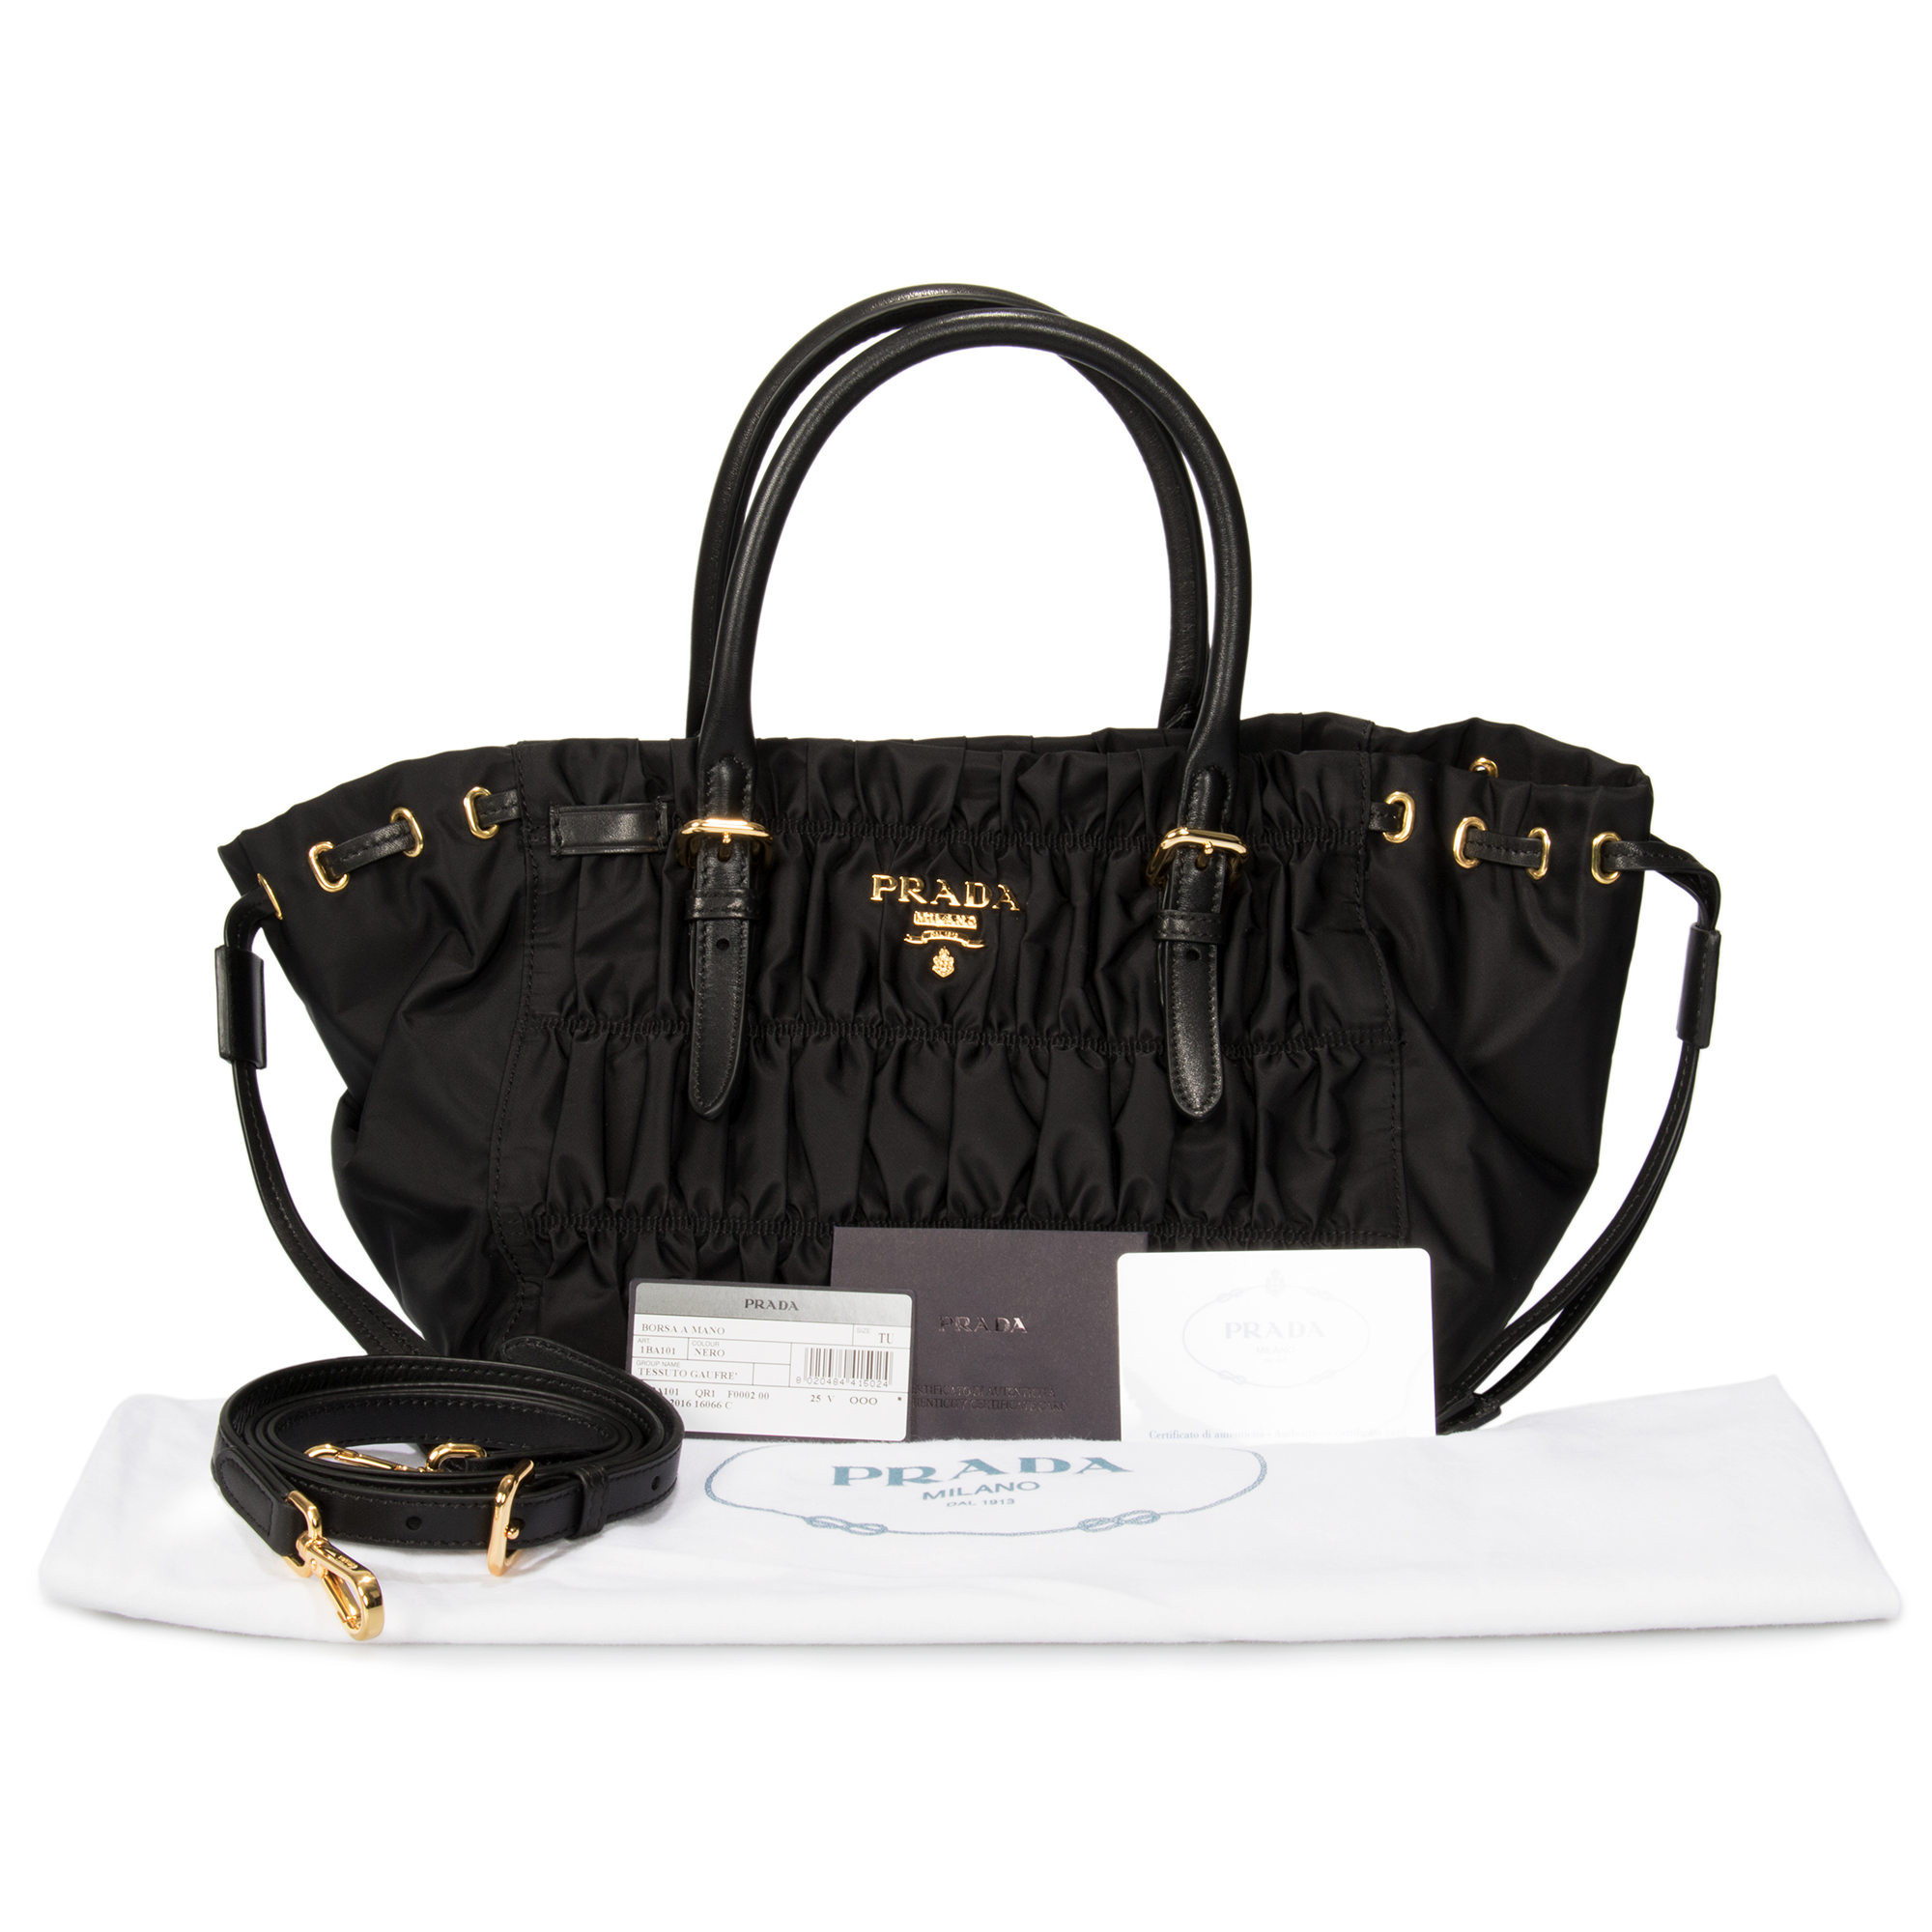 9a73ad223f9a aliexpress prada tessuto gaufre prada tessuto gaufre tote burgundy bn1336  76718 73802; top quality prada gaufre fabric handbag in black walmart 87a77  09332